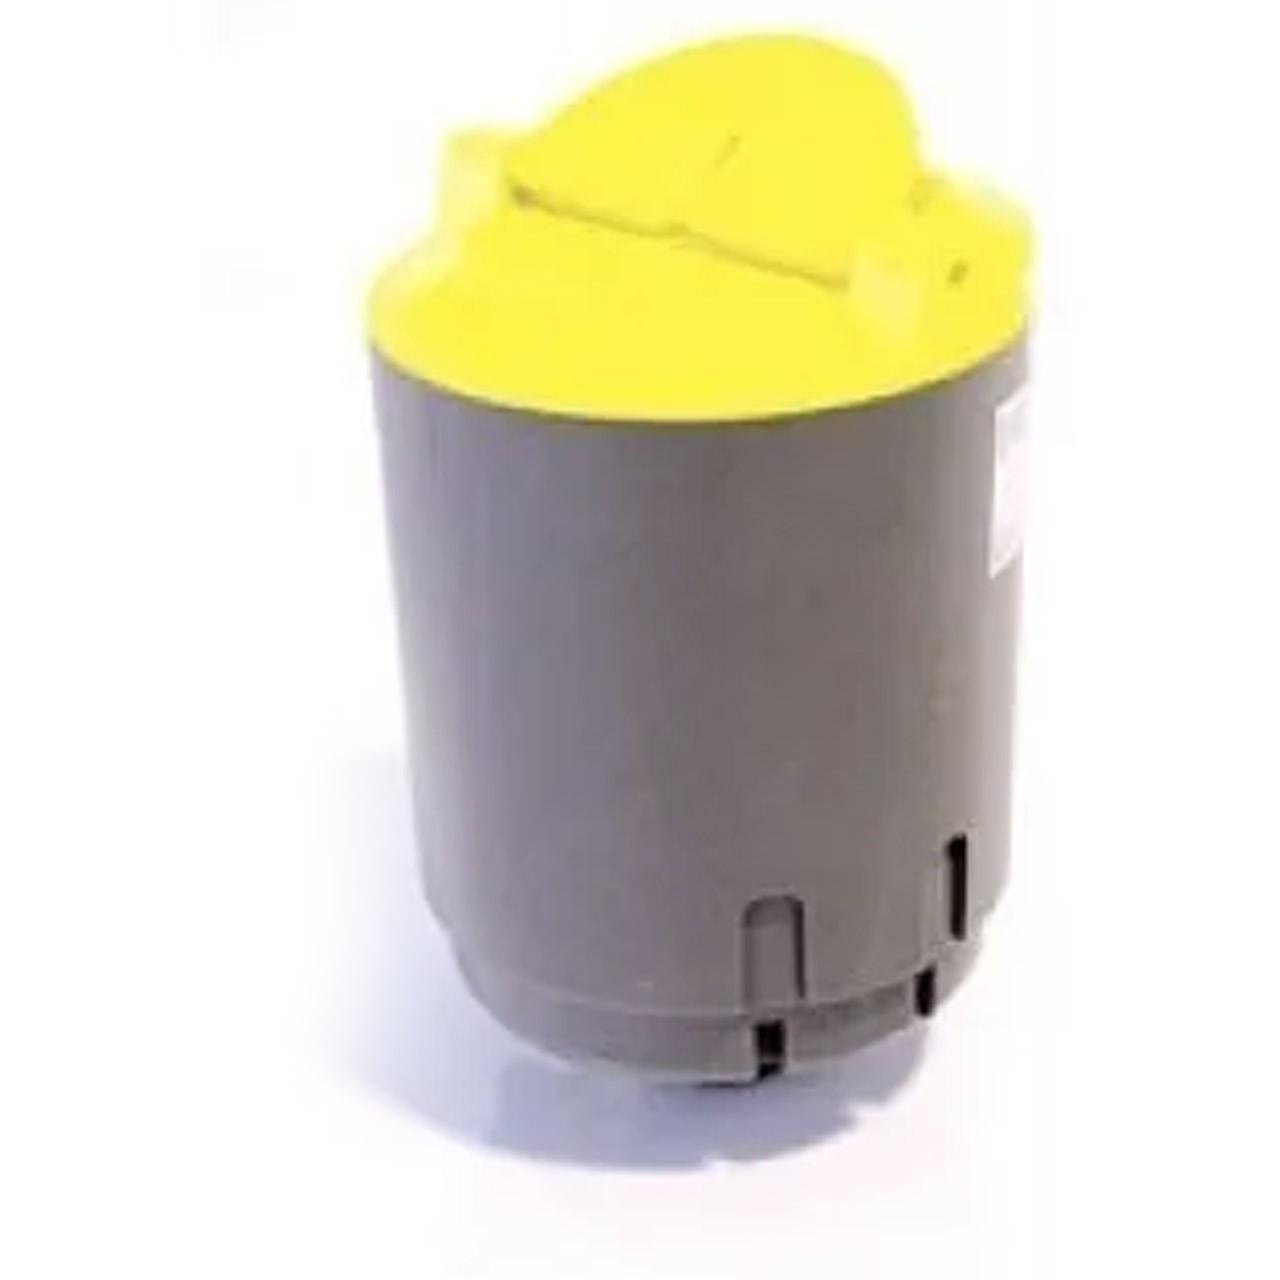 Toner Amarelo P/ impressora laser Compatível Clp300 Clp-k300a C300a M300a Y300a - CLP300 AMARELO